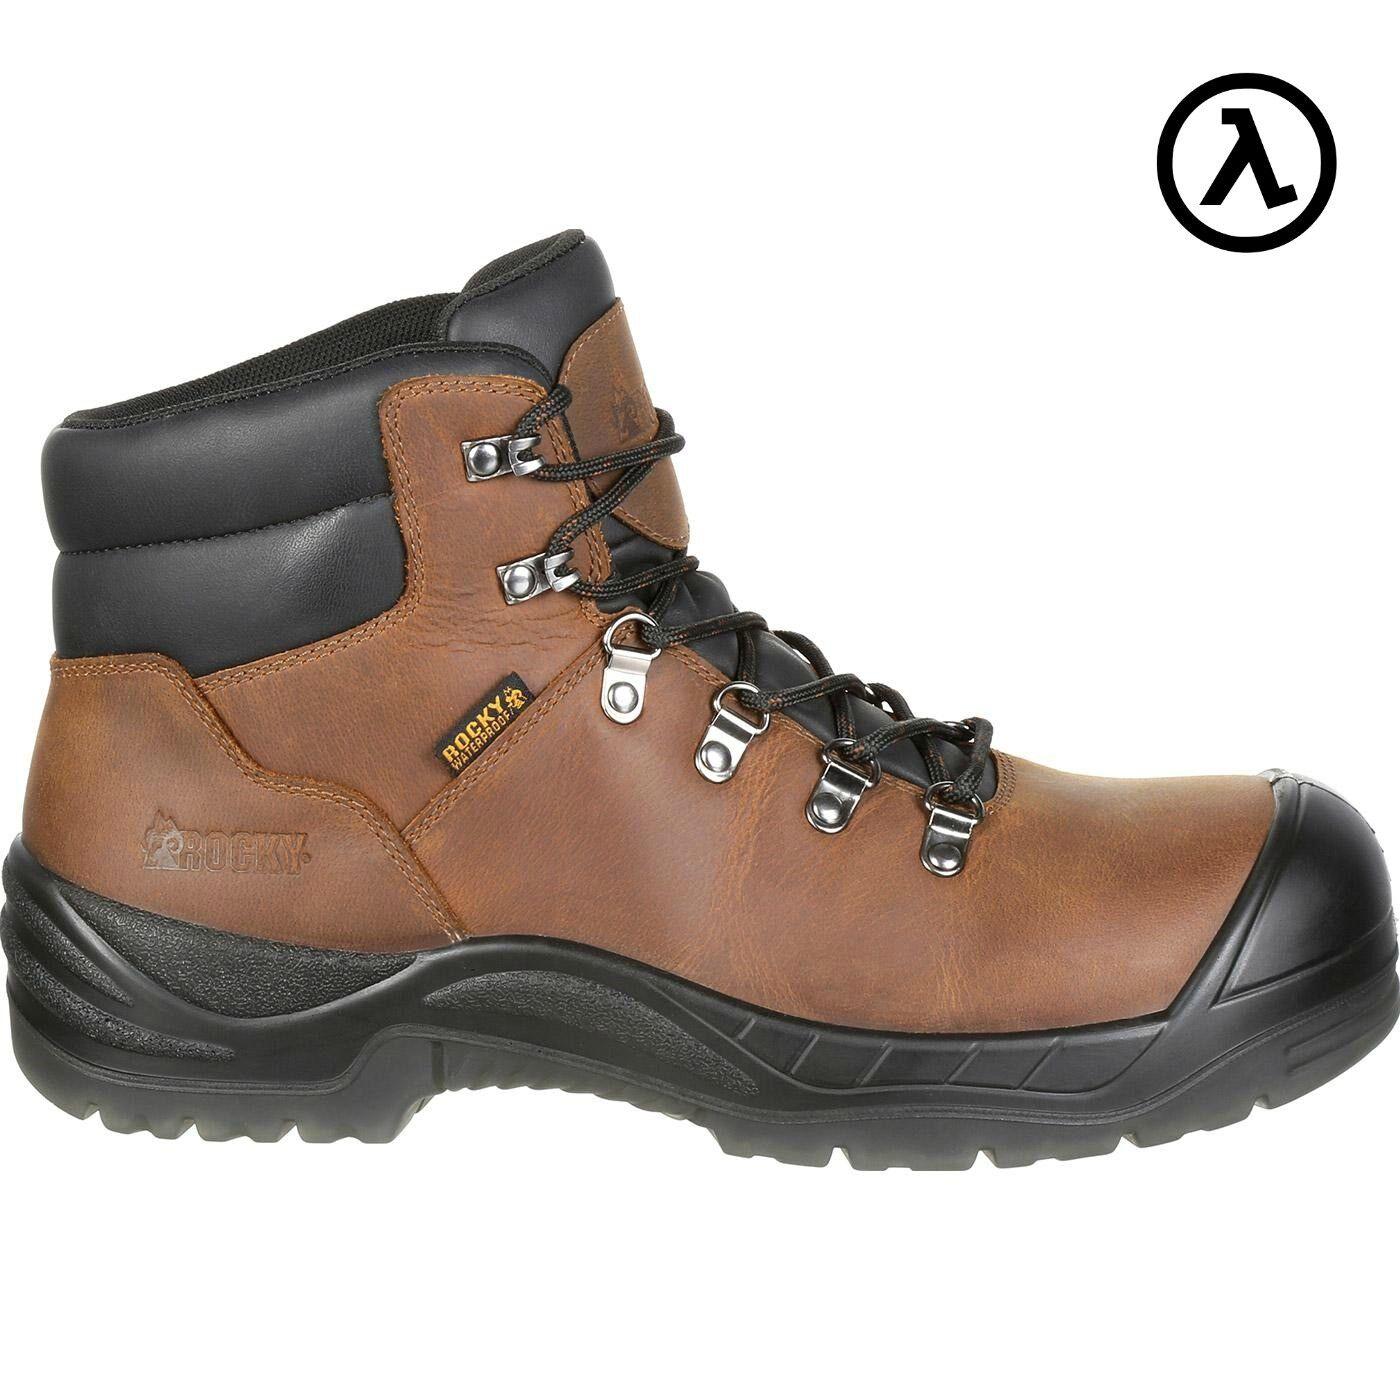 12e04b1c9842 Men s Justin Black Iguana Lizard Leather Slip-on Cowboy Cowboy Cowboy Boots  Size 7.5